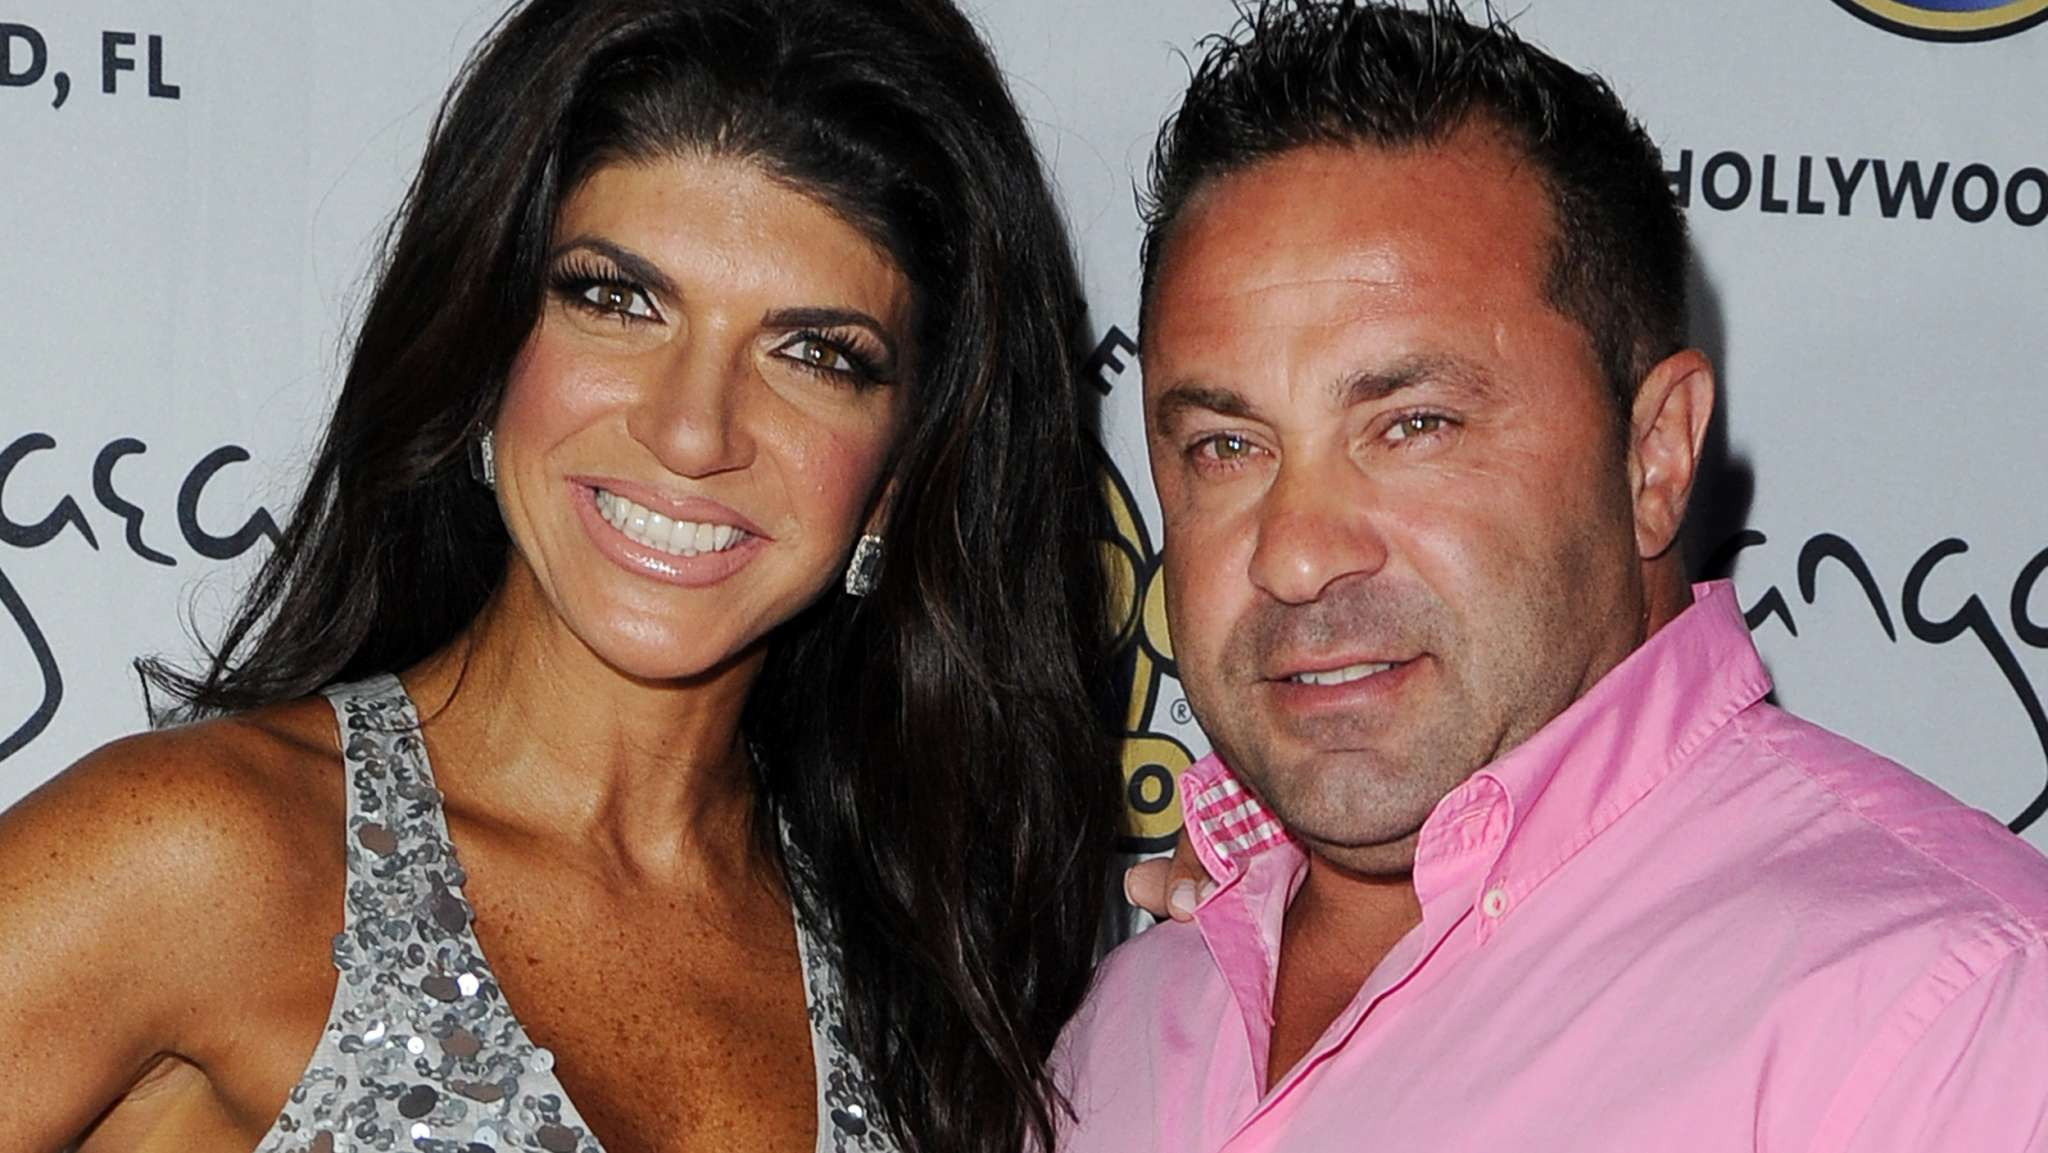 Real Housewives' Joe and Teresa Giudice may split